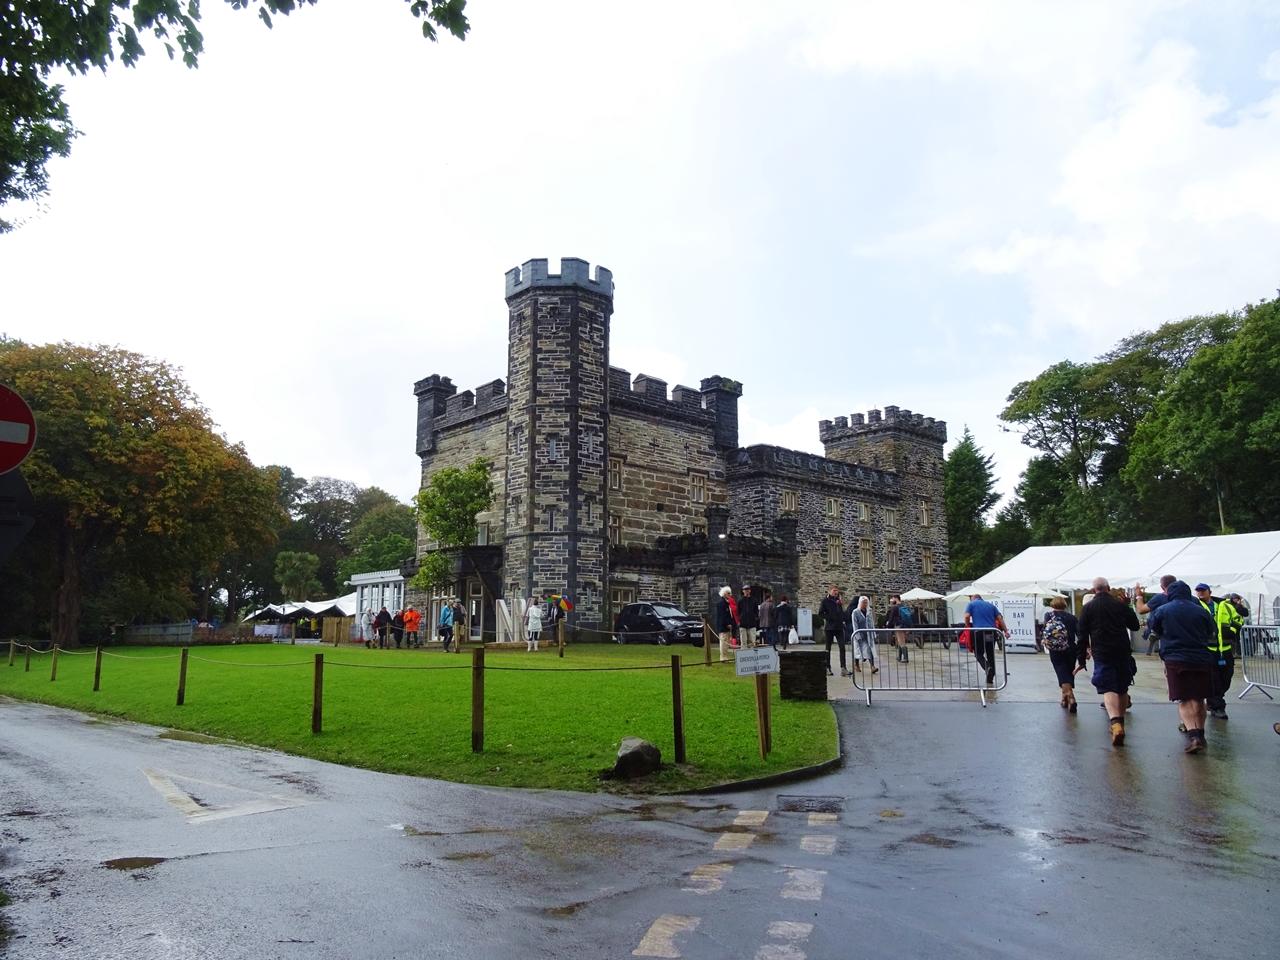 portmeirion castle village festival number 6 2017